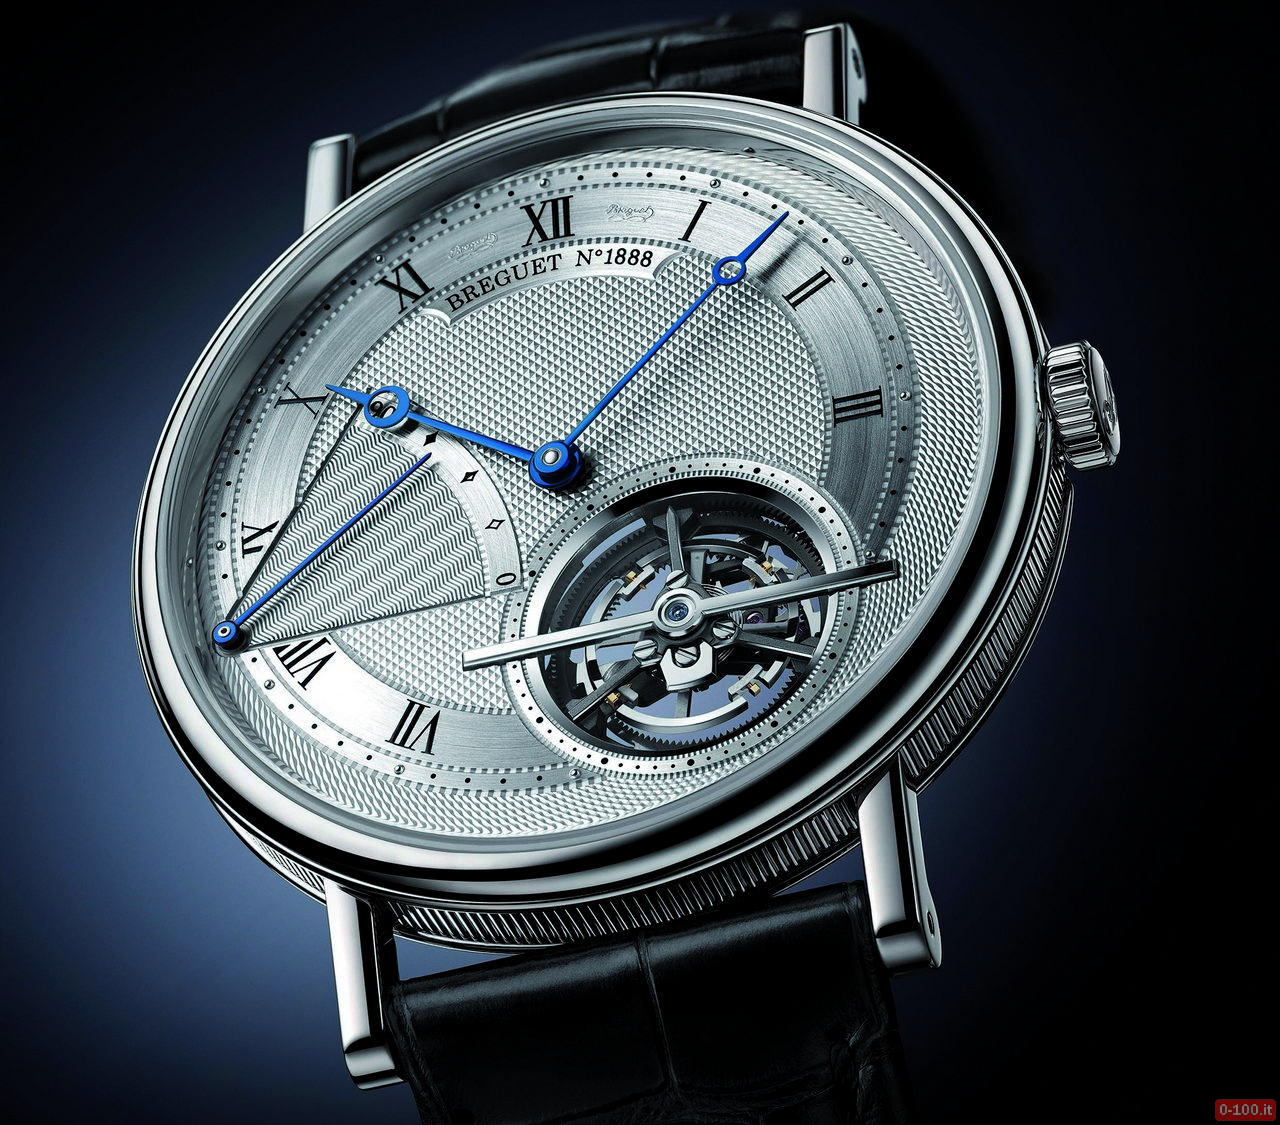 anteprima-baselworld-2014-breguet-classique-grande-complication-tourbillon-extra-plat-automatique-5377-0-100_5